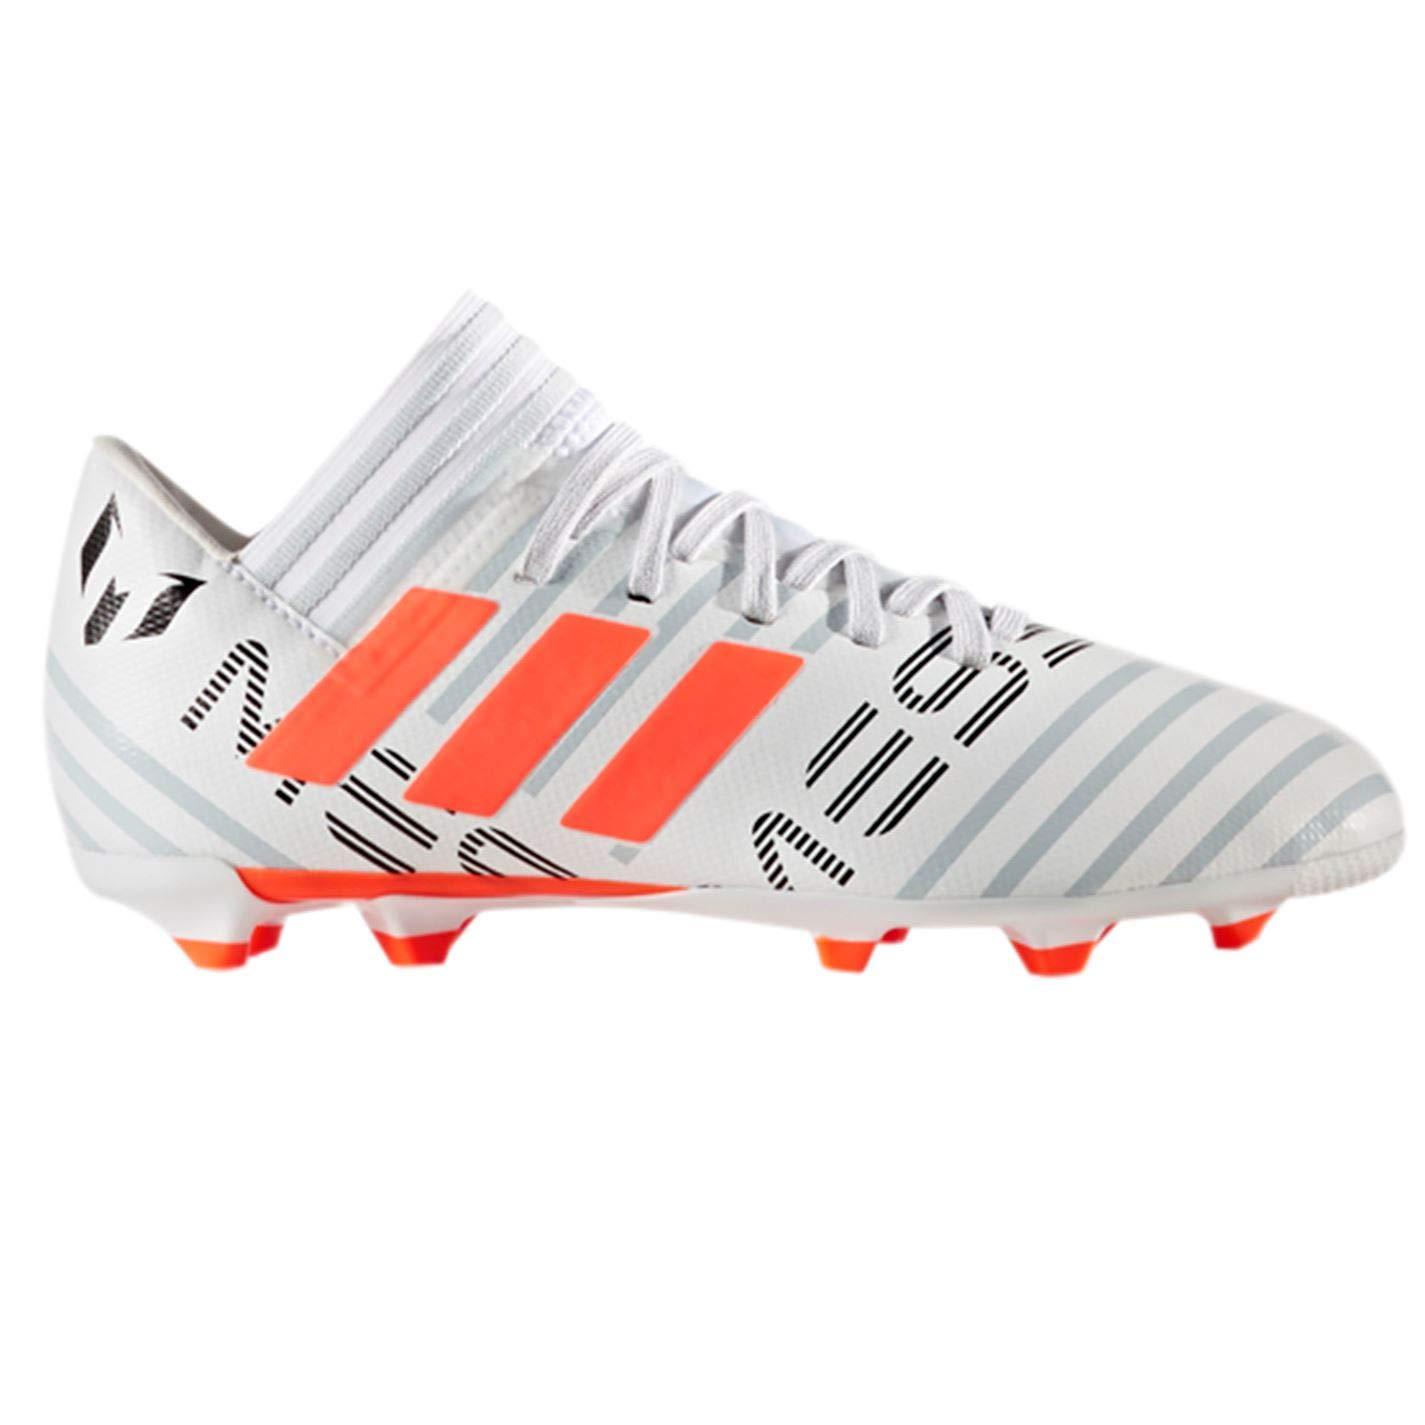 promo code b3a2e 90b7e adidas Unisex Kids  Nemeziz Messi 17.3 Fg J Football Boots  Amazon.co.uk   Shoes   Bags